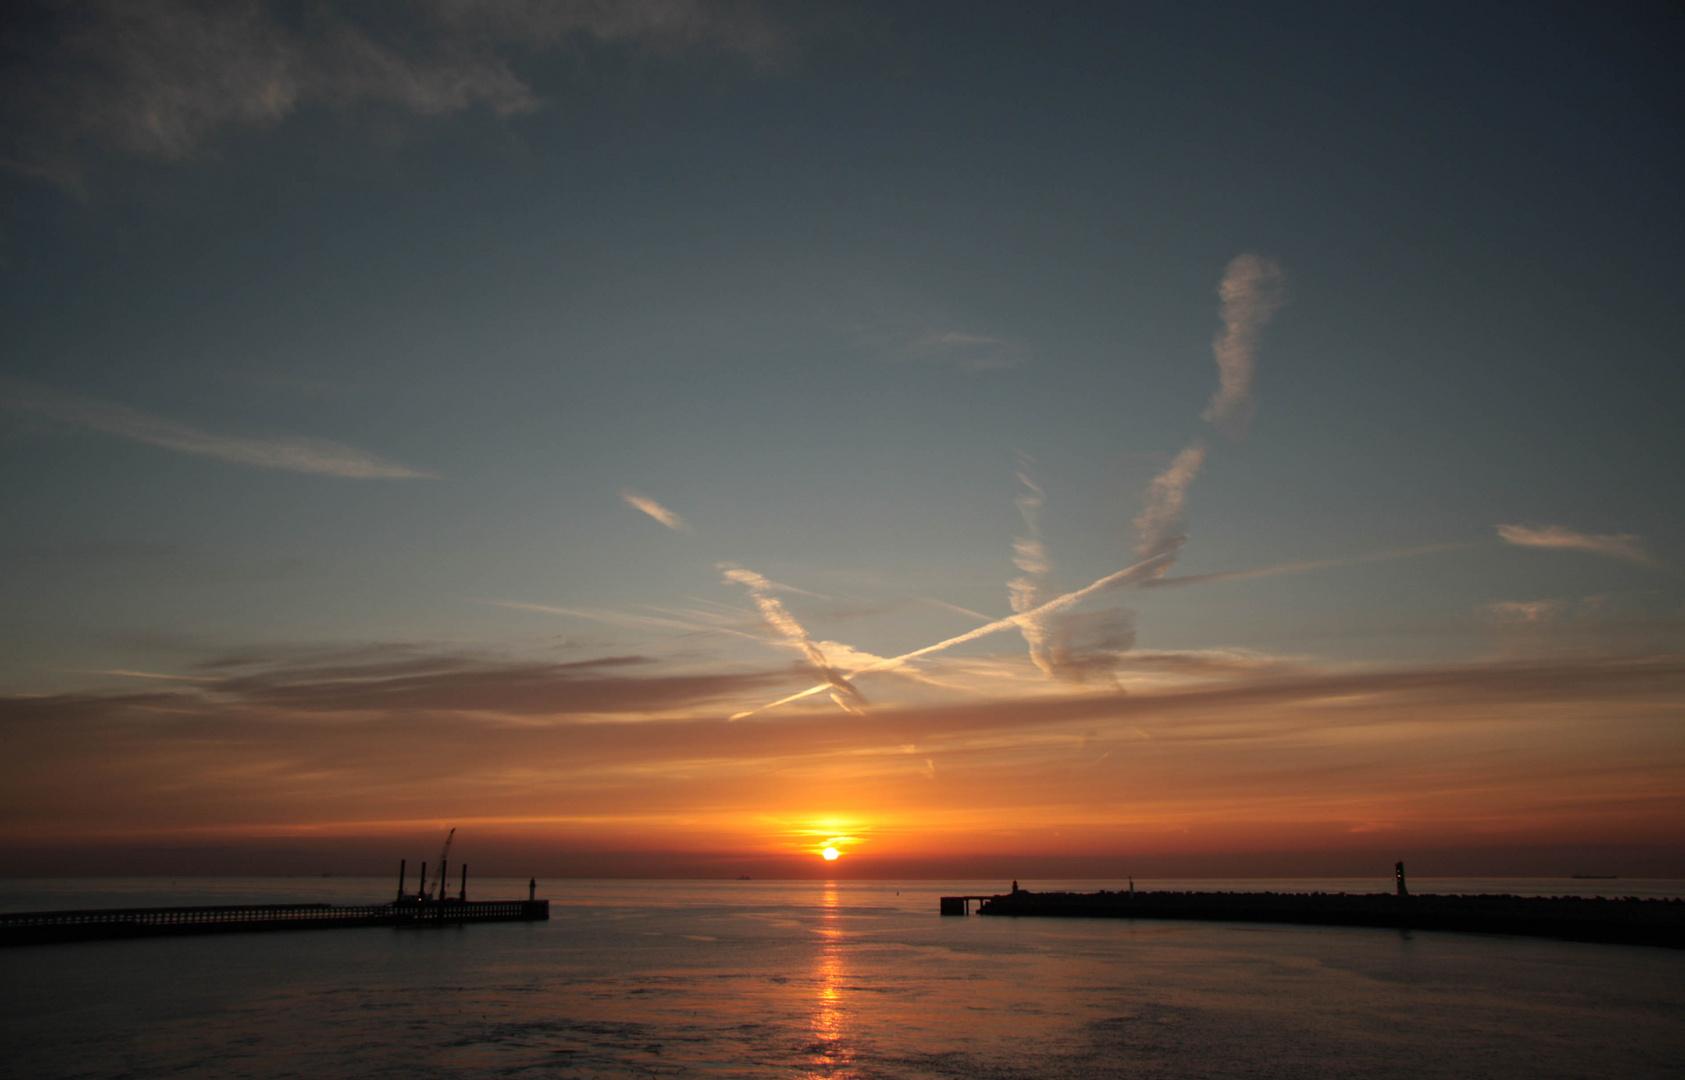 Sonnenuntergang am Ärmelkanal